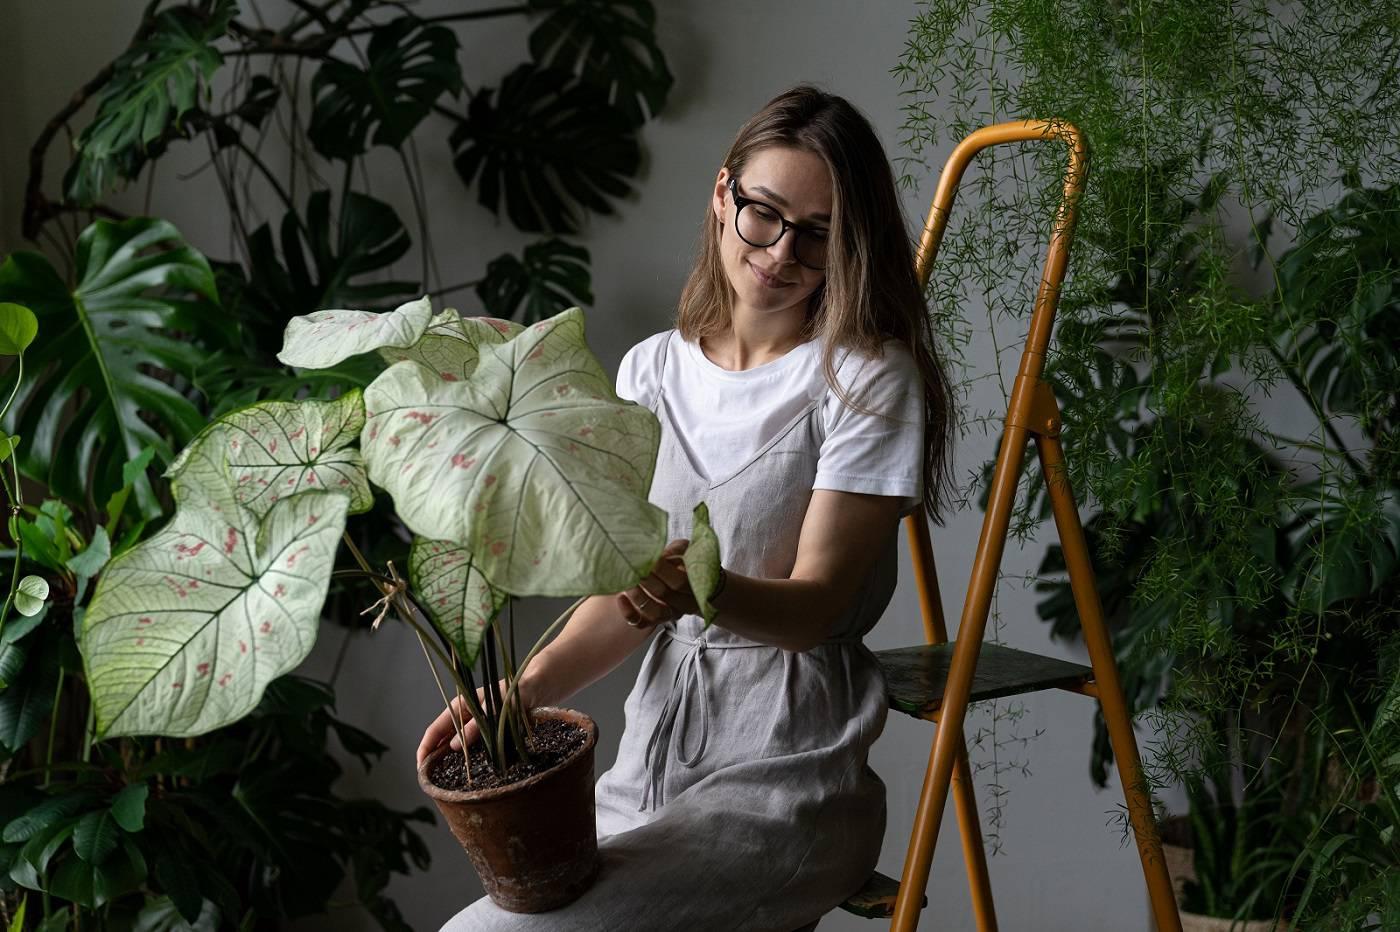 woman-gardener-grey-linen-dress-holding-caladium-houseplant-with-large-white-leaves-green-veins-clay-pot-sitting-stepladder-her-home-love-plants-indoor-gardening.jpg